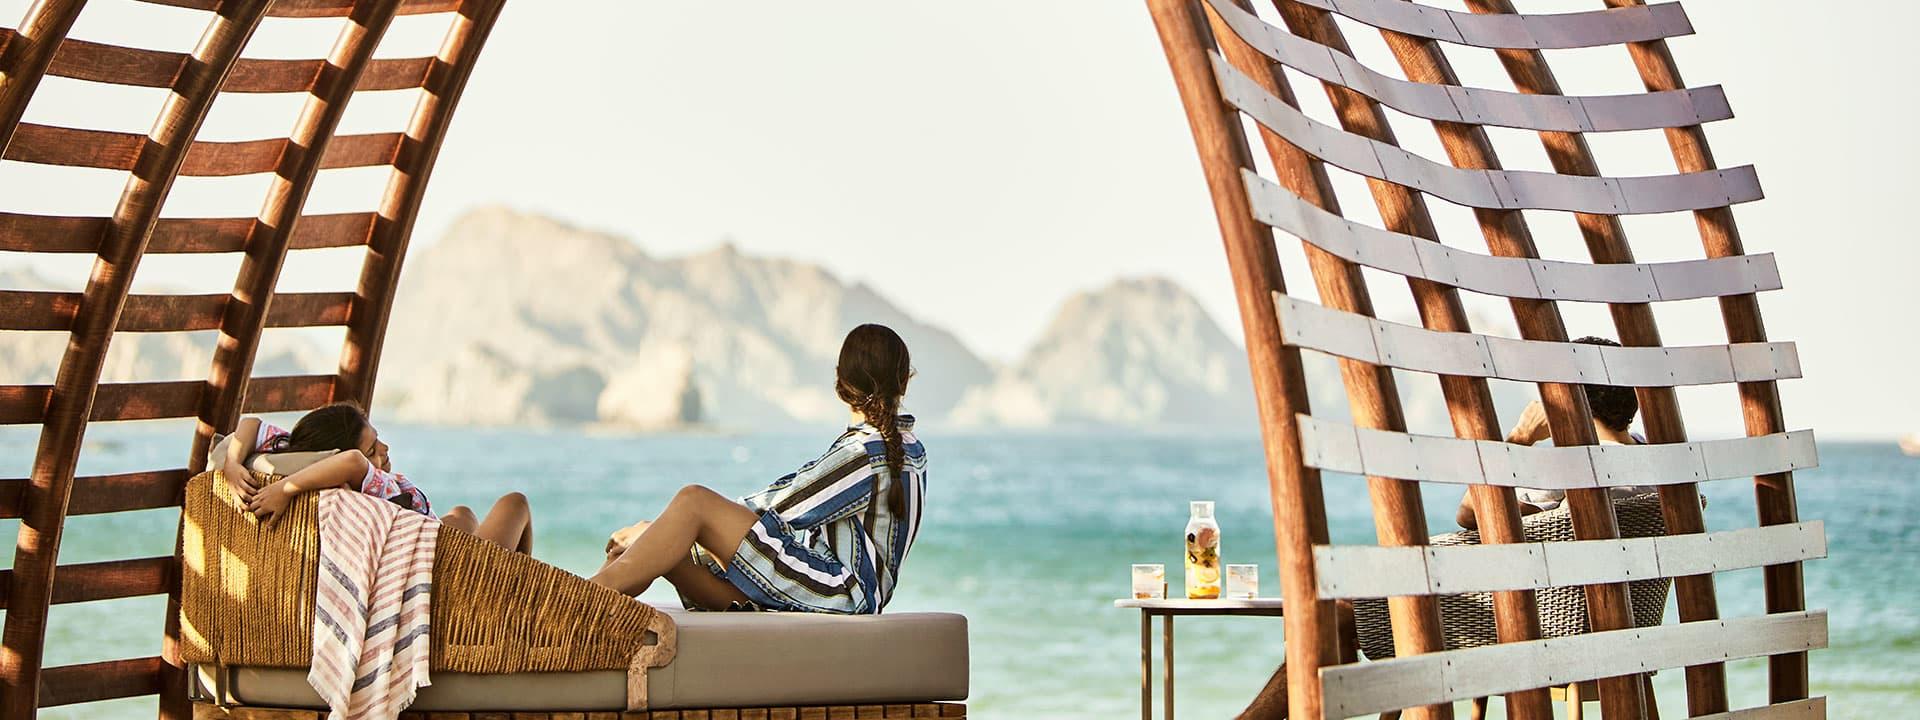 Theritzcarltonhotel brand of marriott hotels and resorts, maryland